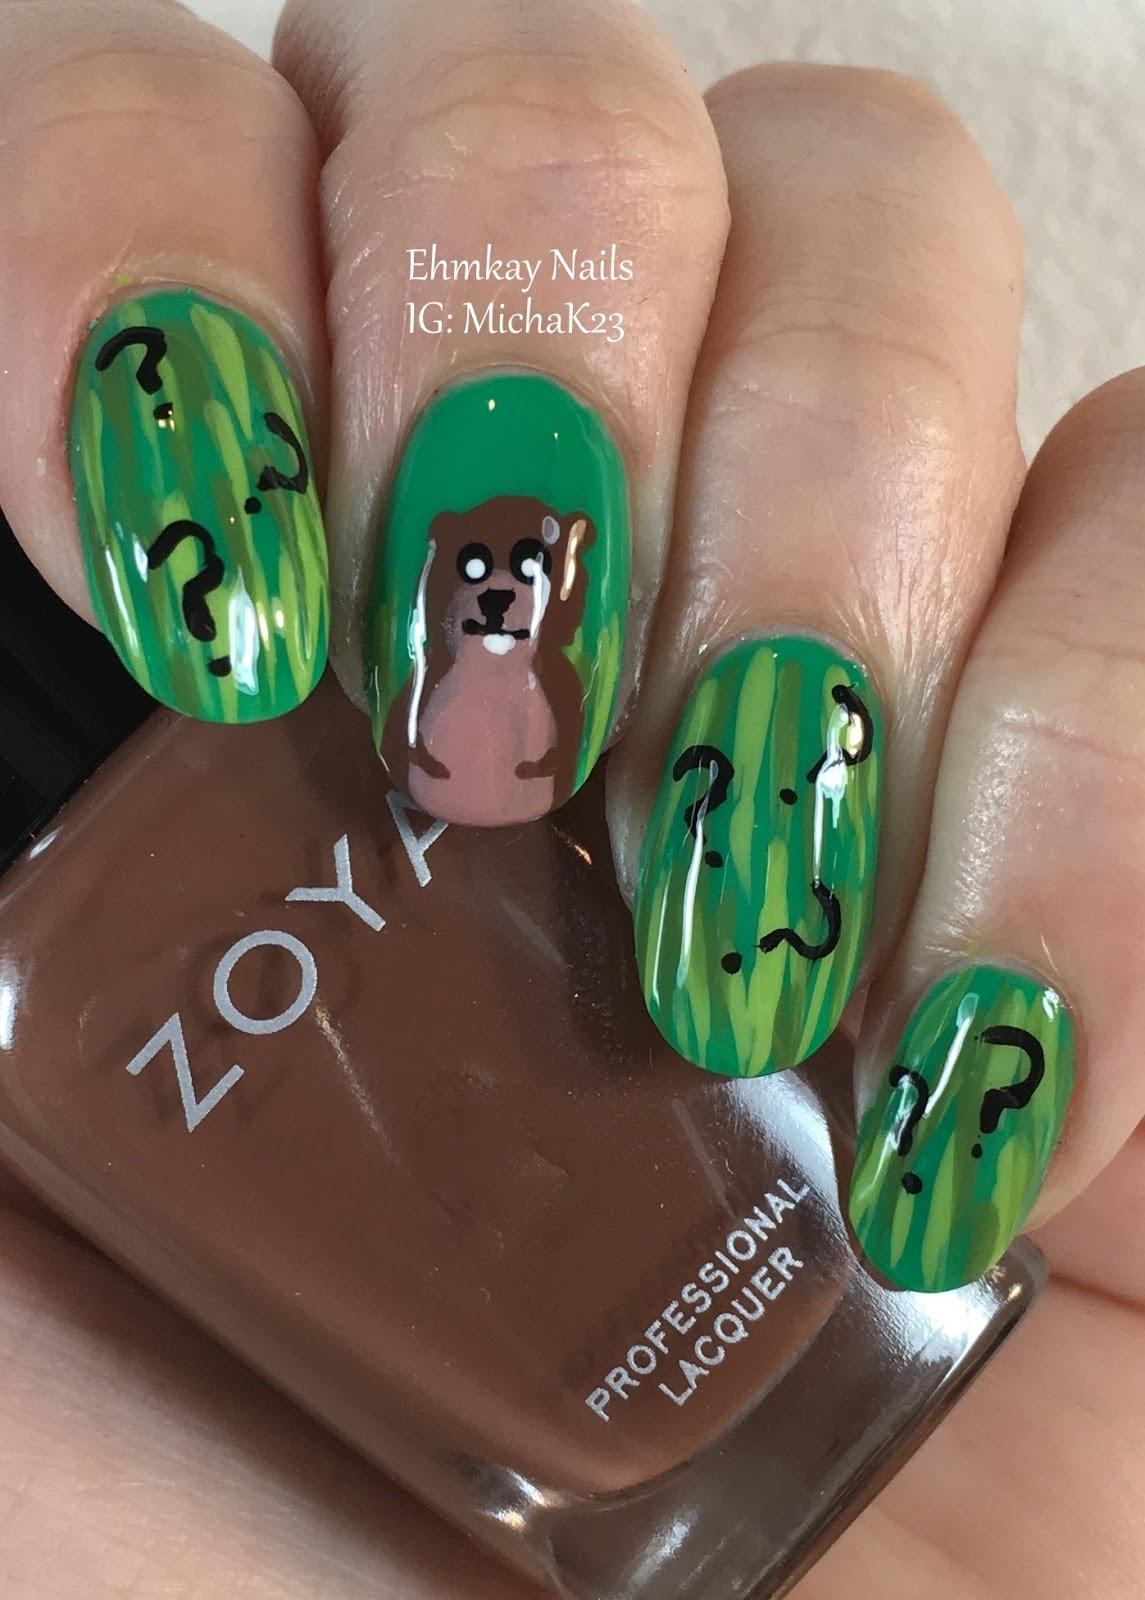 Ehmkay Nails New Year S Eve Nail Art With Kbshimmer Bling: Ehmkay Nails: Punxsutawney Phil Groundhog Day Nail Art